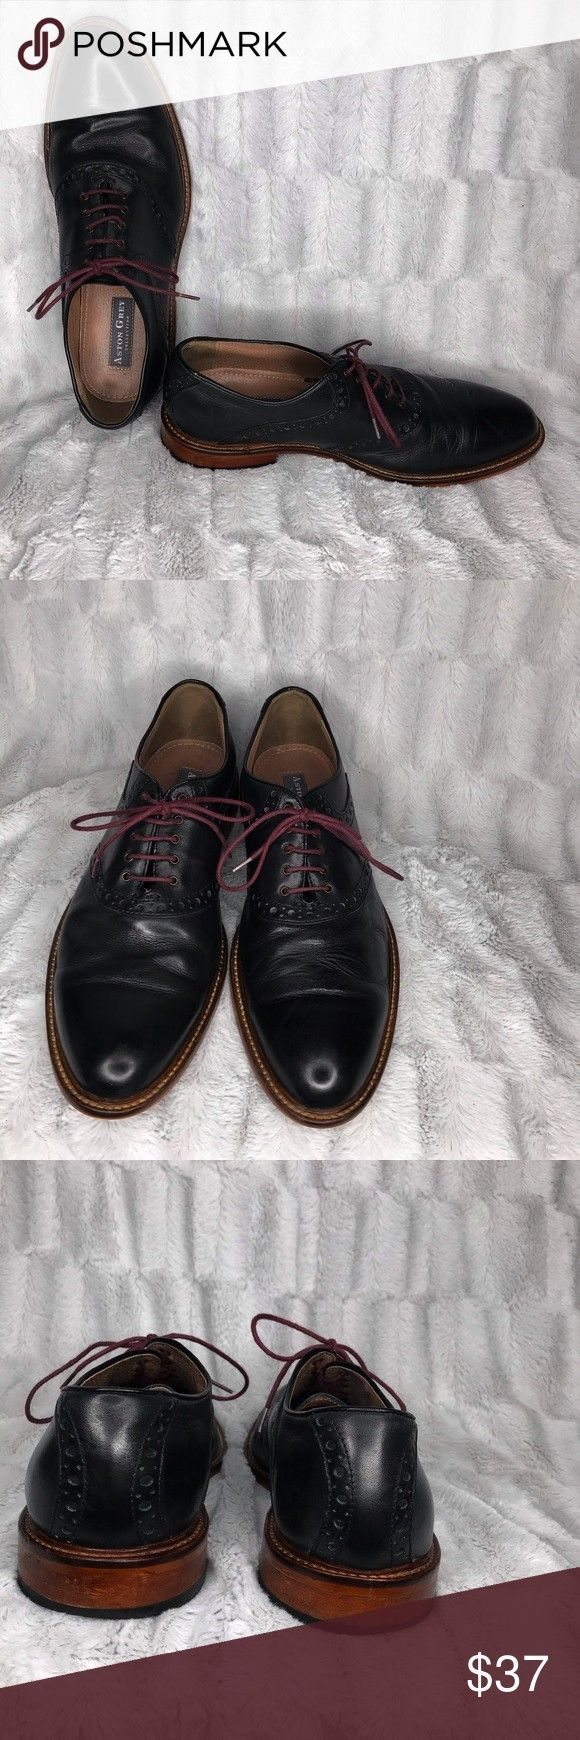 Grey Mens Black Dress Shoe Aston Grey Mens Black Dress Shoe Aston G  Aston Grey Mens Black Dress Shoe Aston Grey Mens Black Dress Shoe Aston Grey Mens Black D Aston Grey...